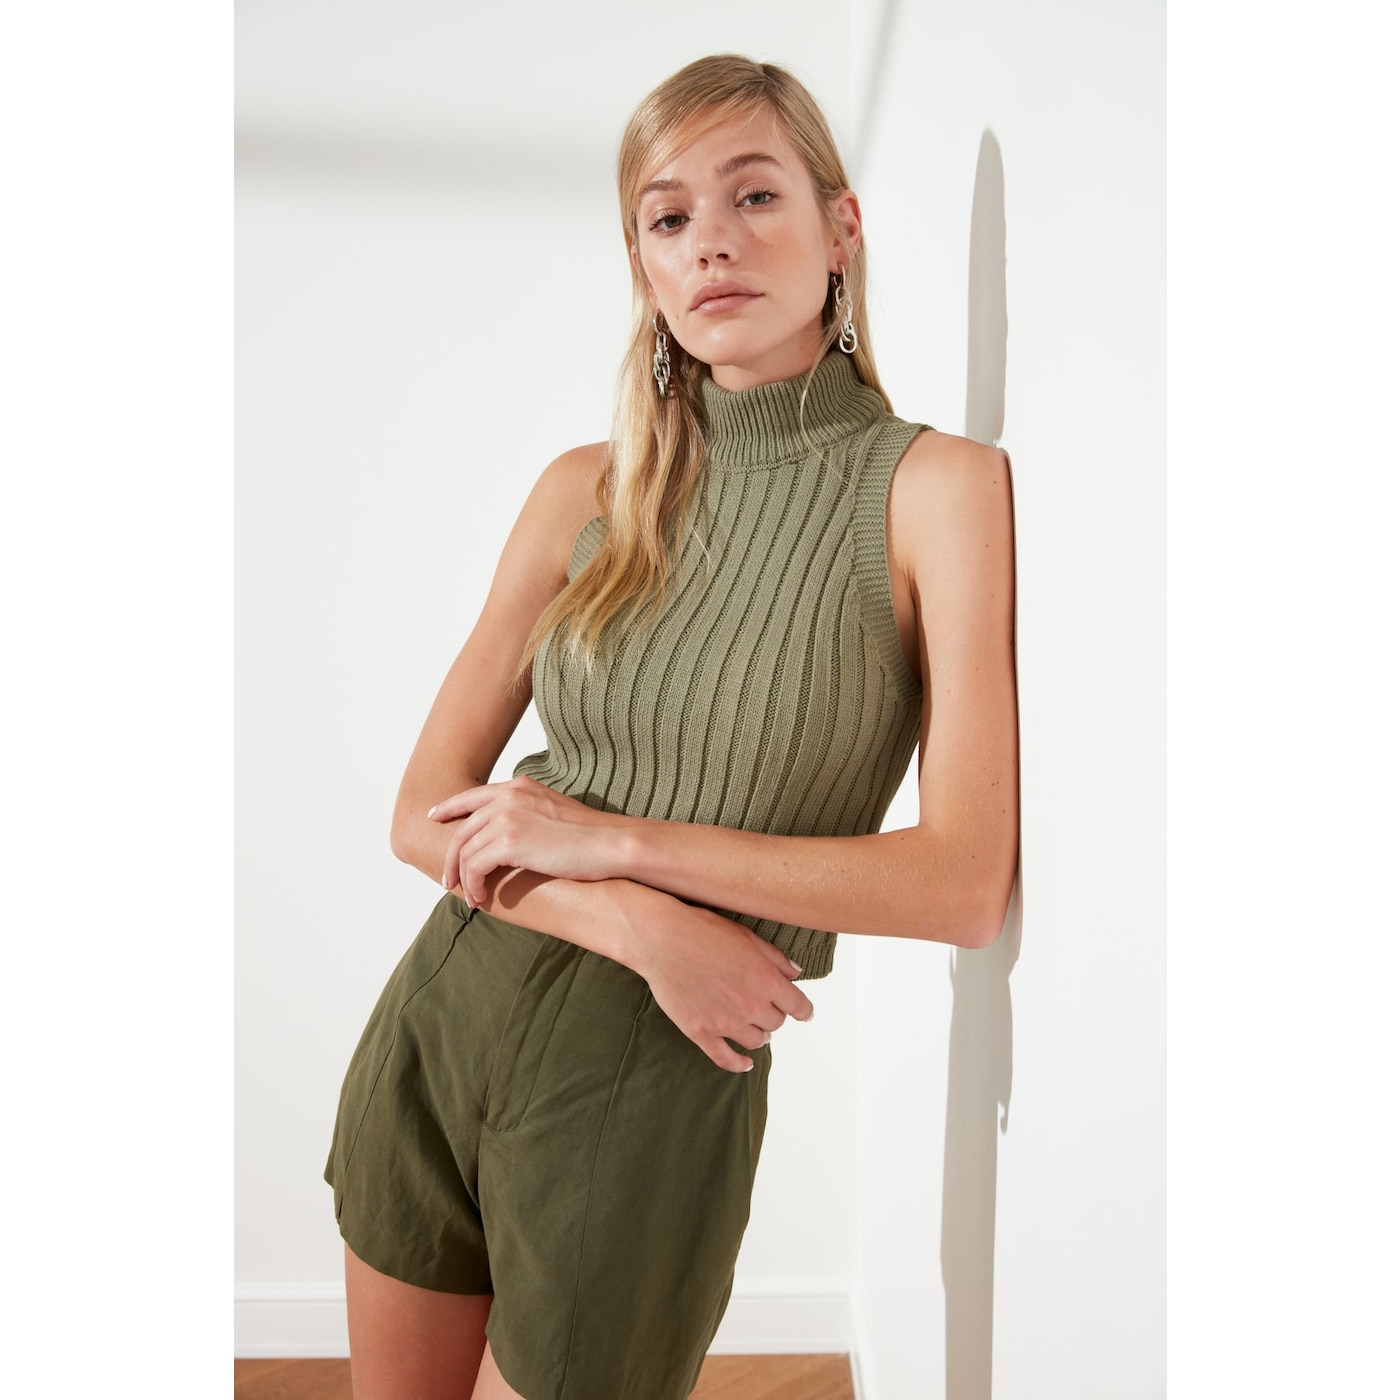 Trendyol Haki Upright Collar Crop Knitwear Blouse dámské Khaki L